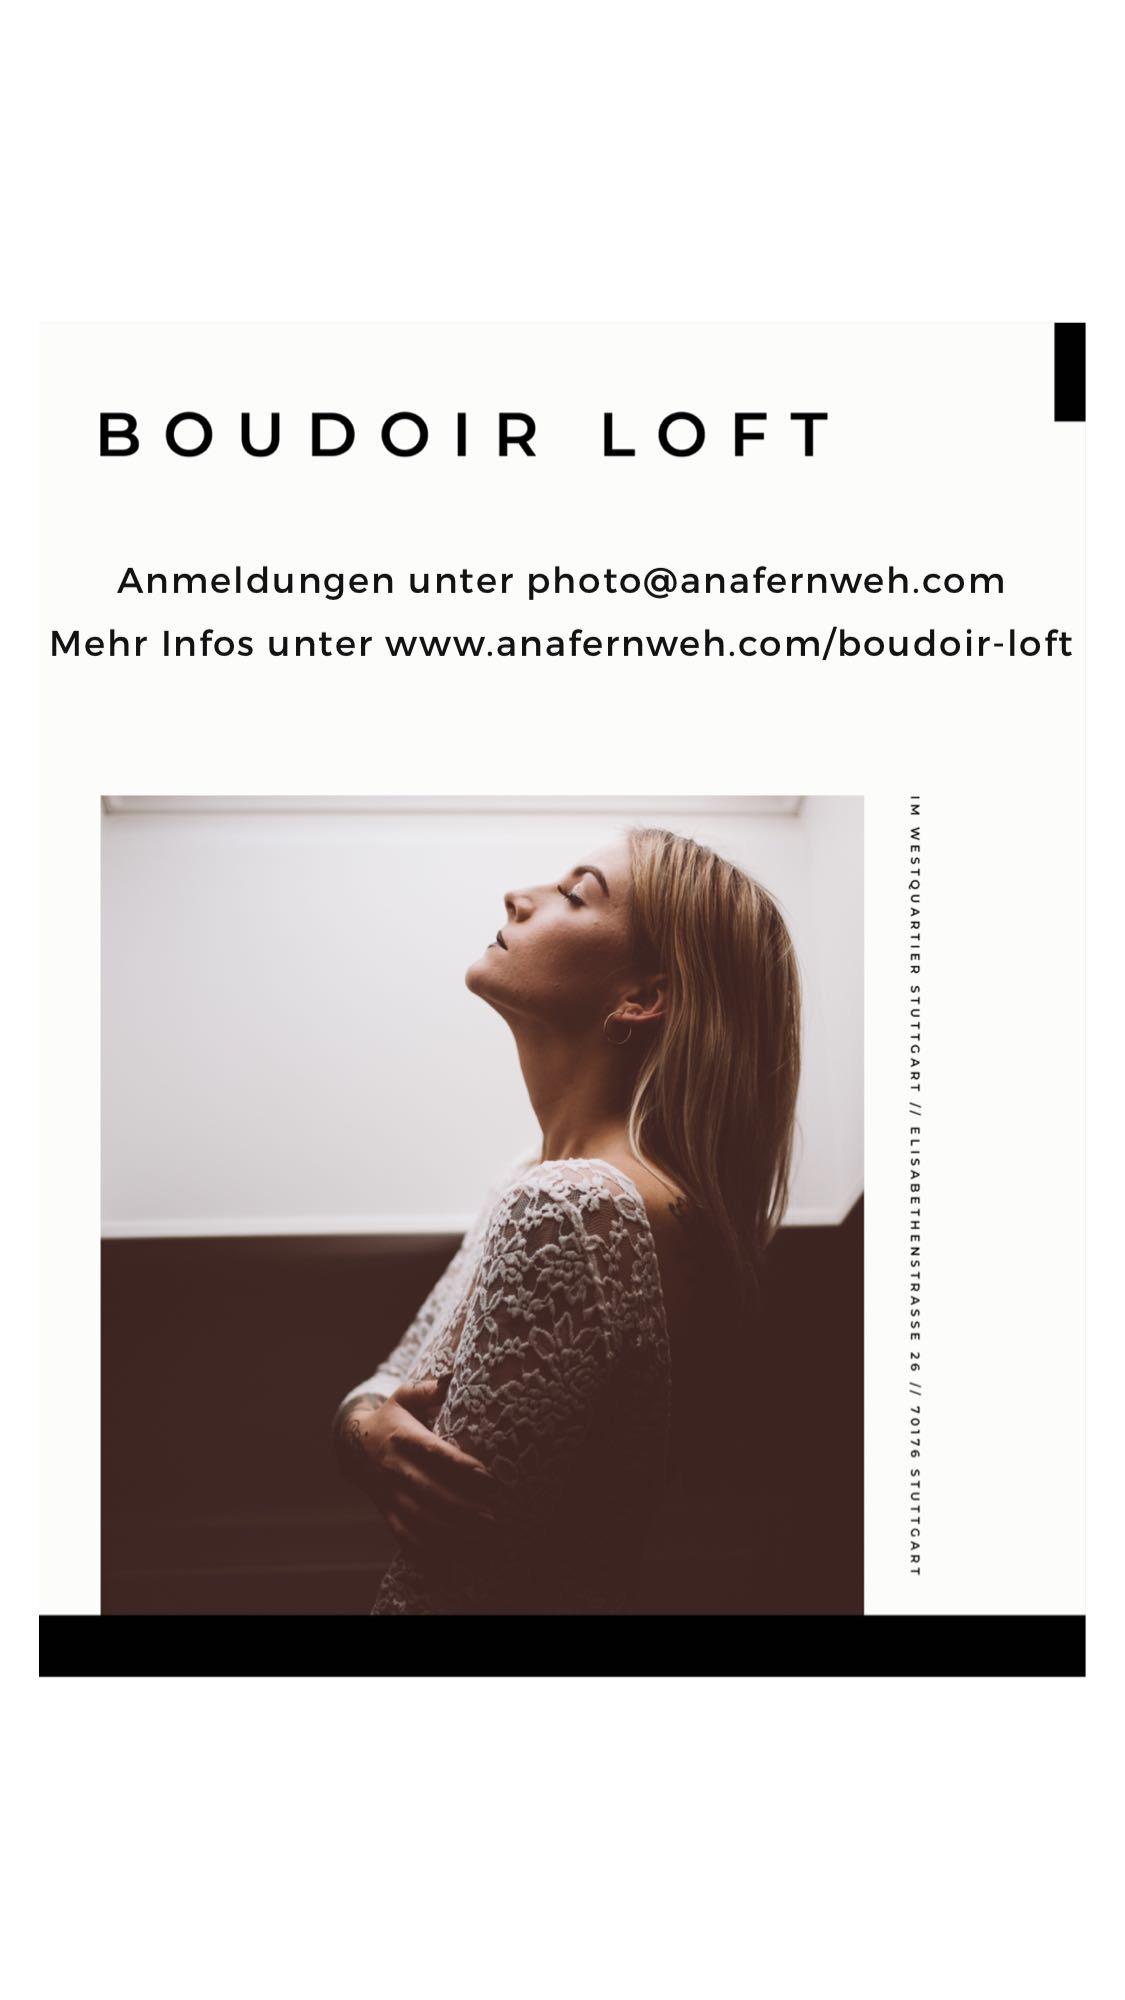 Boudoir Loft 05.08.2018 | Ana Fernweh | Destination Wedding Photographer